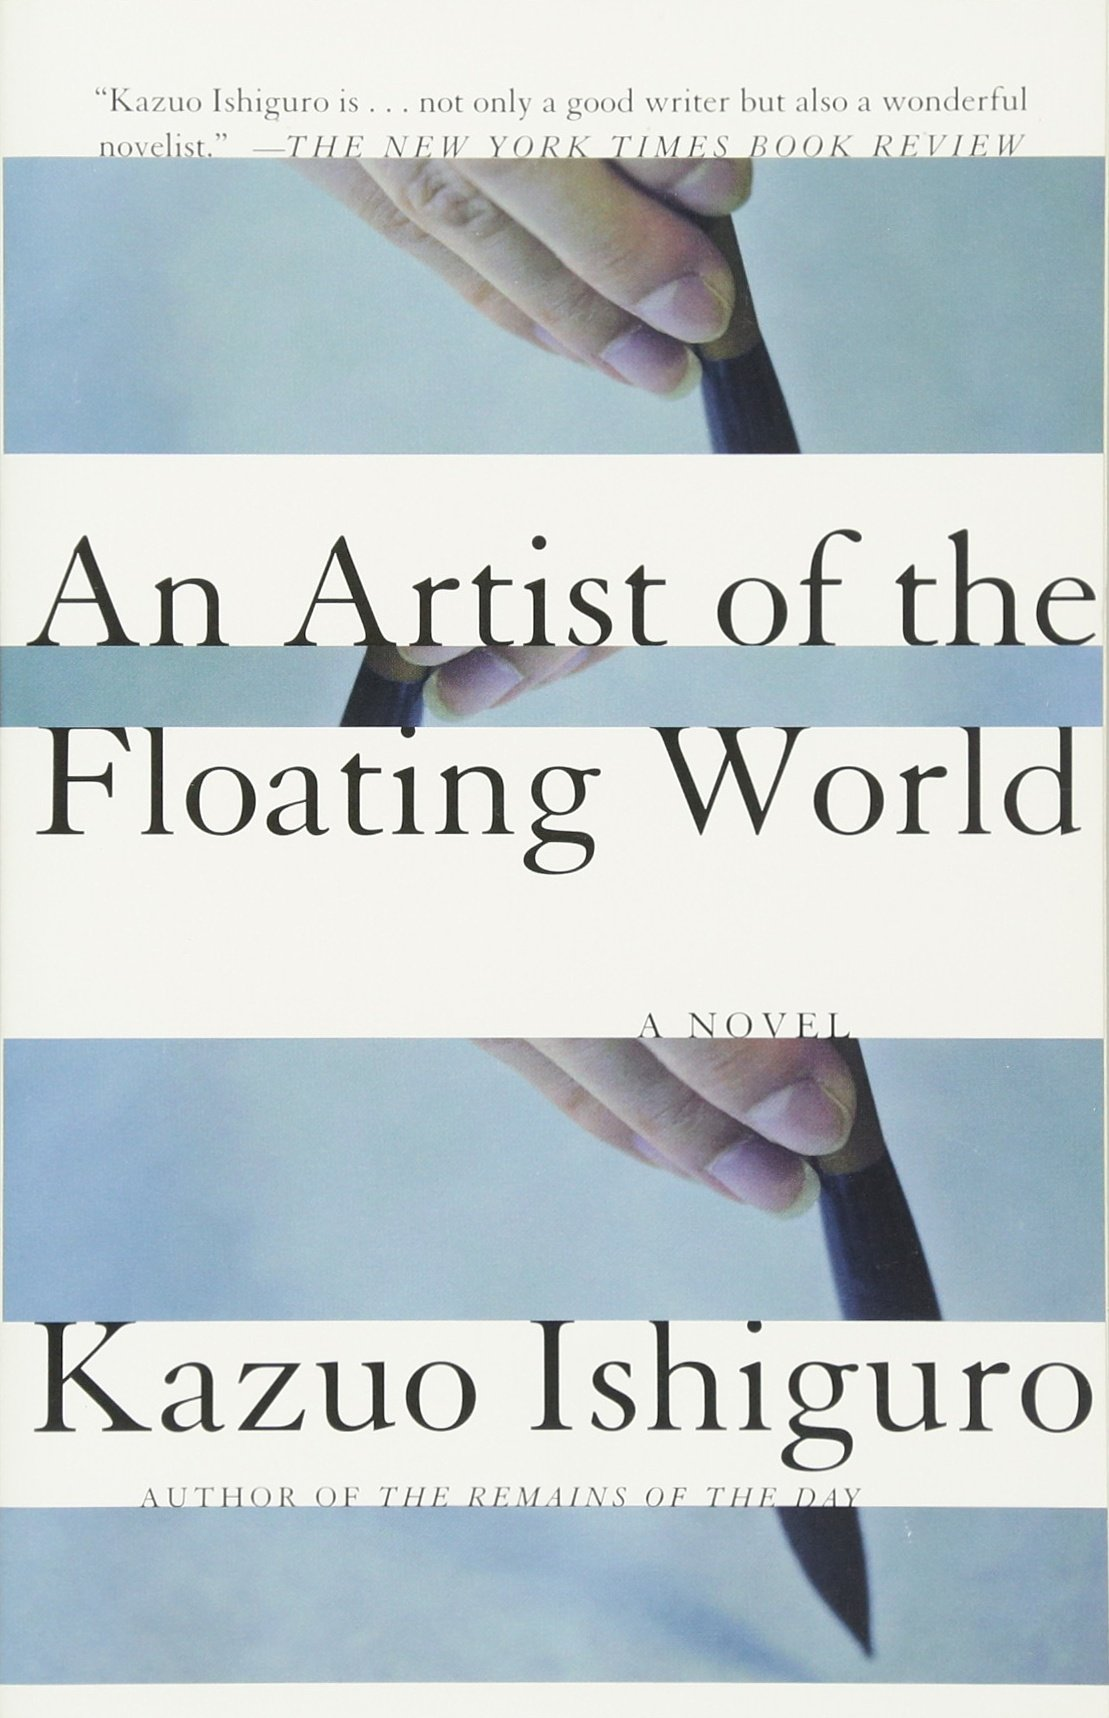 An Artist Of The Floating World: Kazuo Ishiguro: 9780679722663: Amazon:  Books